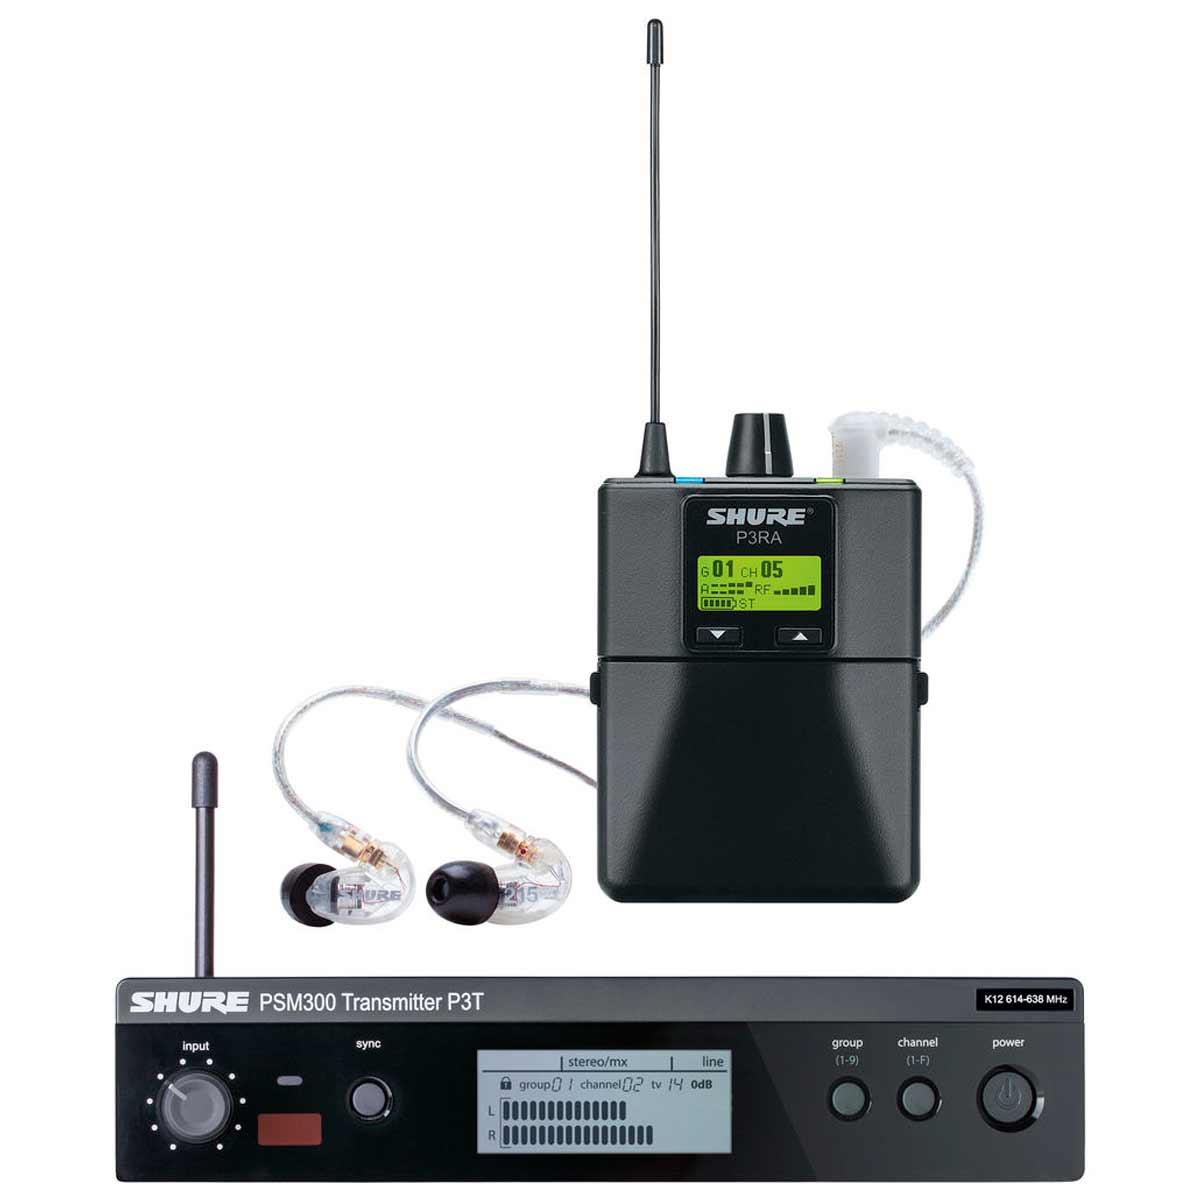 PSM300SE215 - Ponto Eletrônico s/ Fio c/ Fone In-ear PSM 300 SE215 - Shure